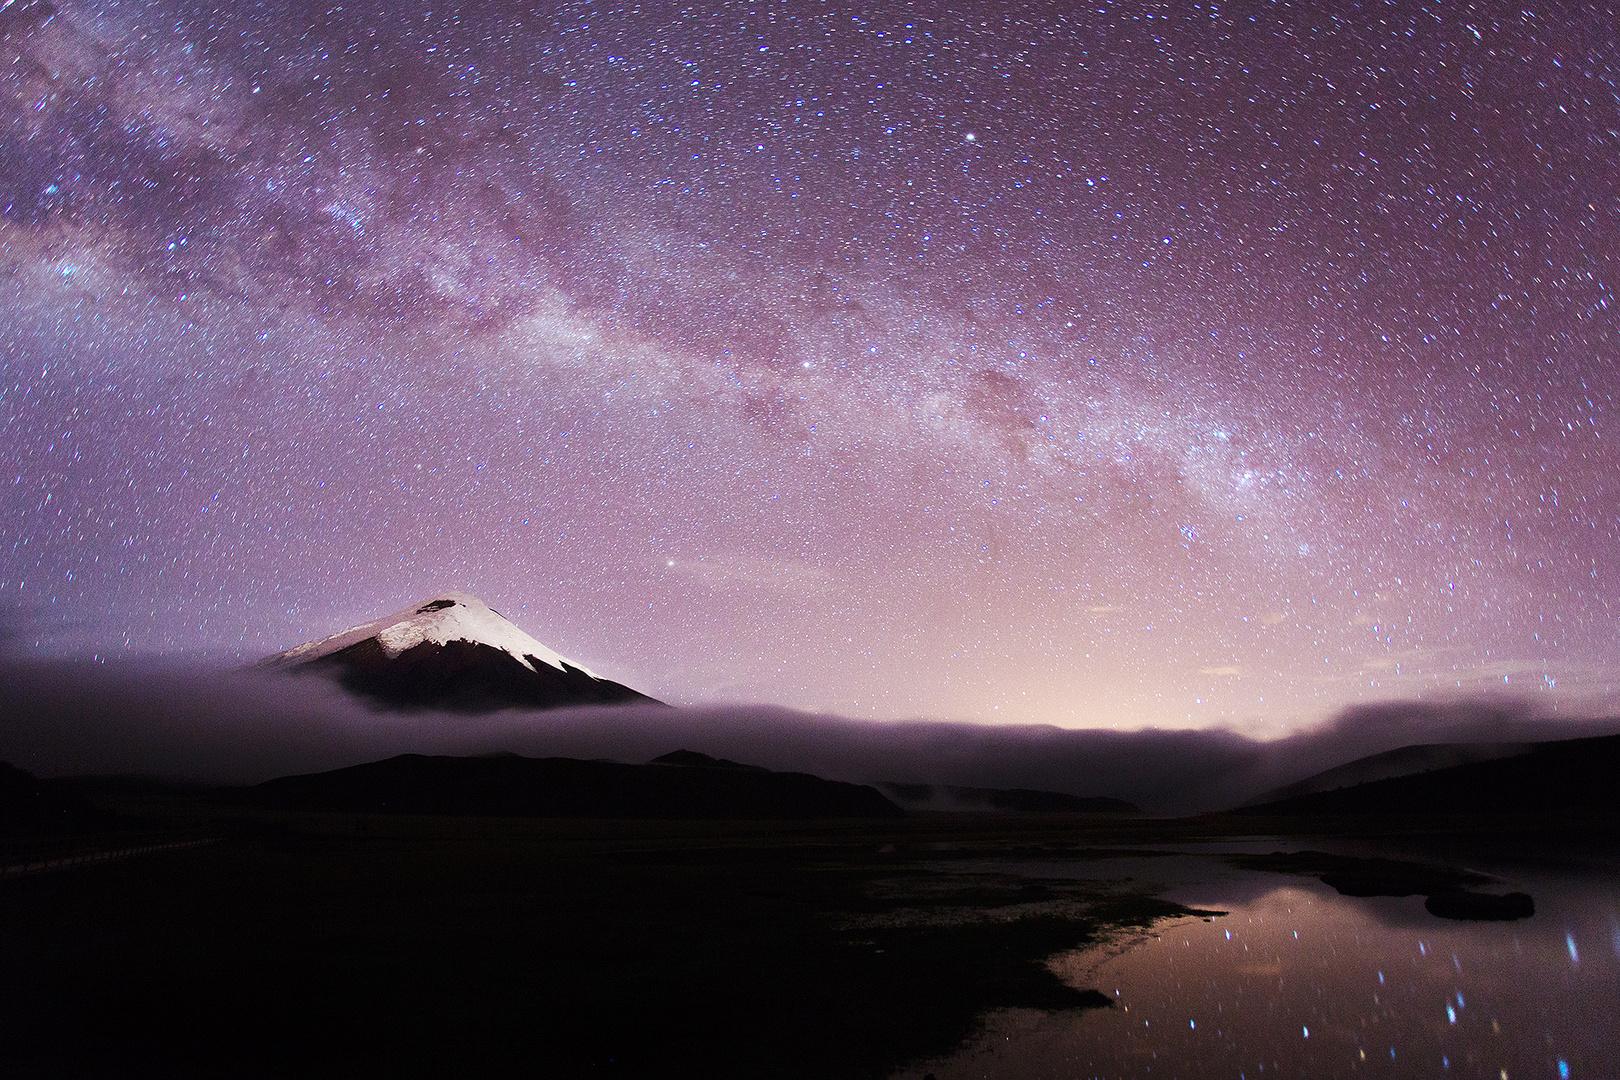 Starlightexpress II